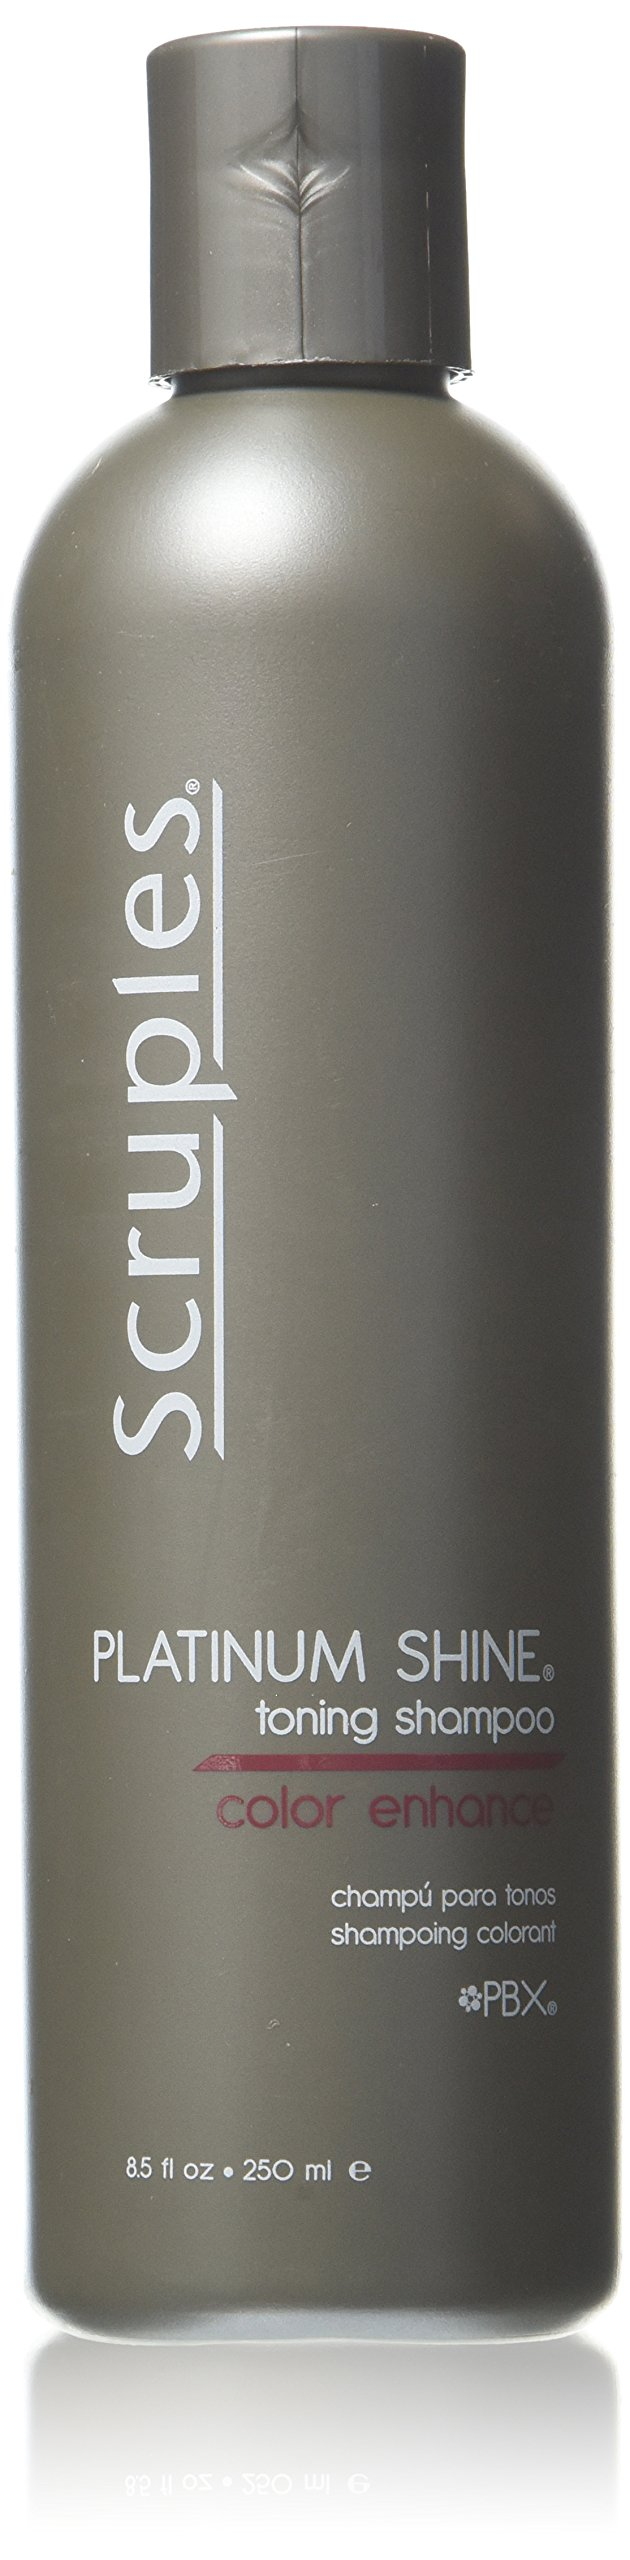 Scruples Platinum Shine Shampoo, 8.5 Fluid Ounce